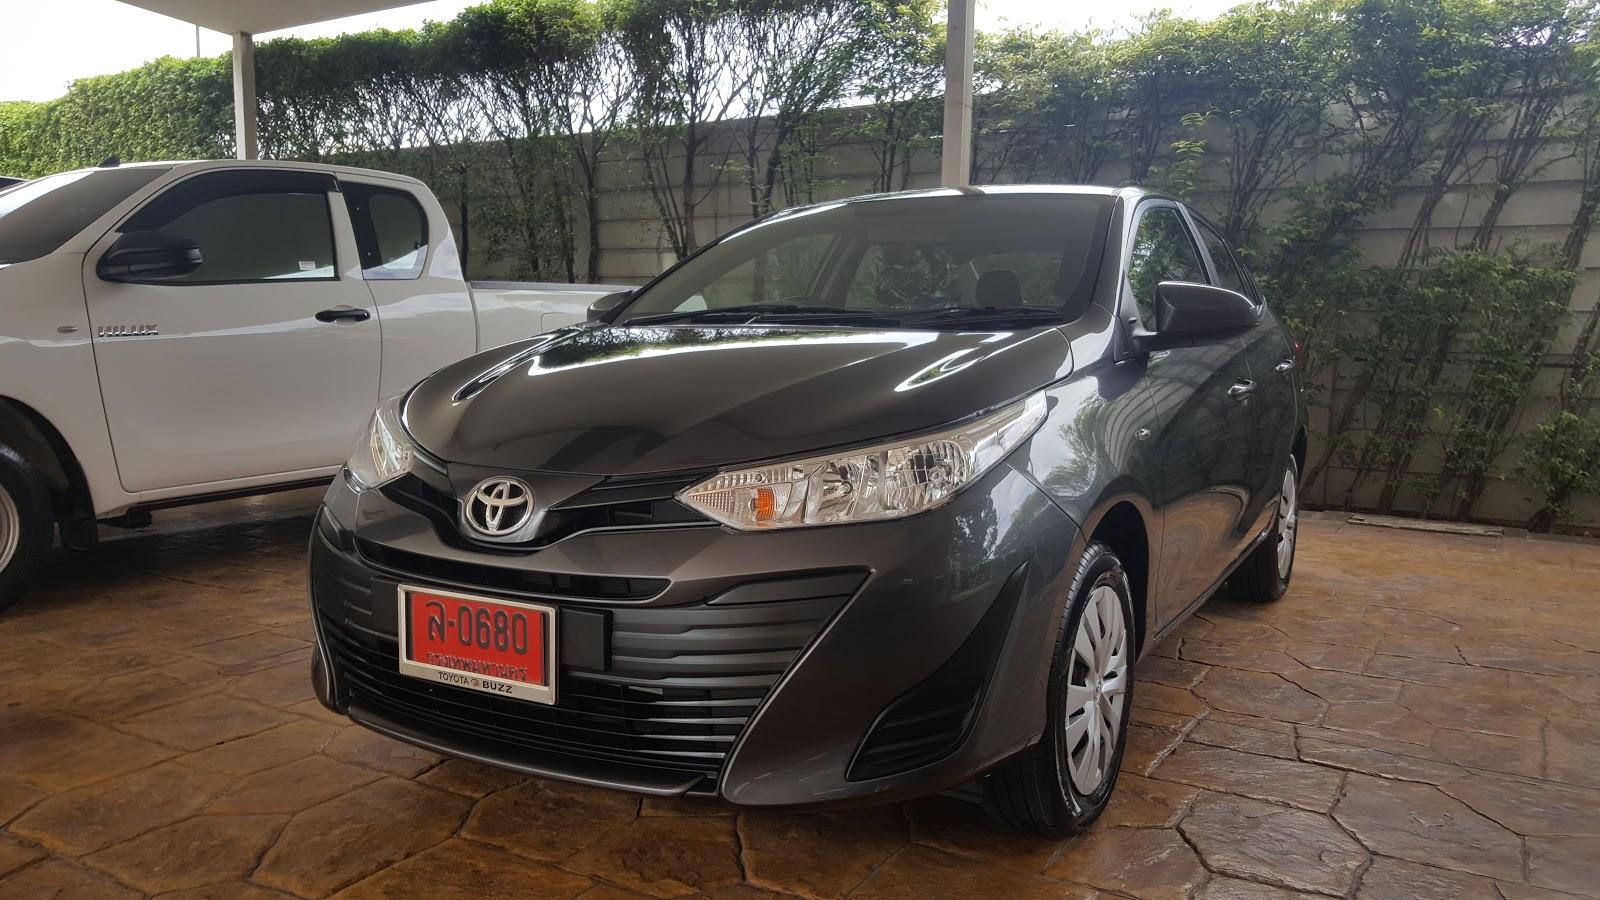 Toyota Yaris Ativ Trd Harga New 2014 บนทกทวไป รวว J